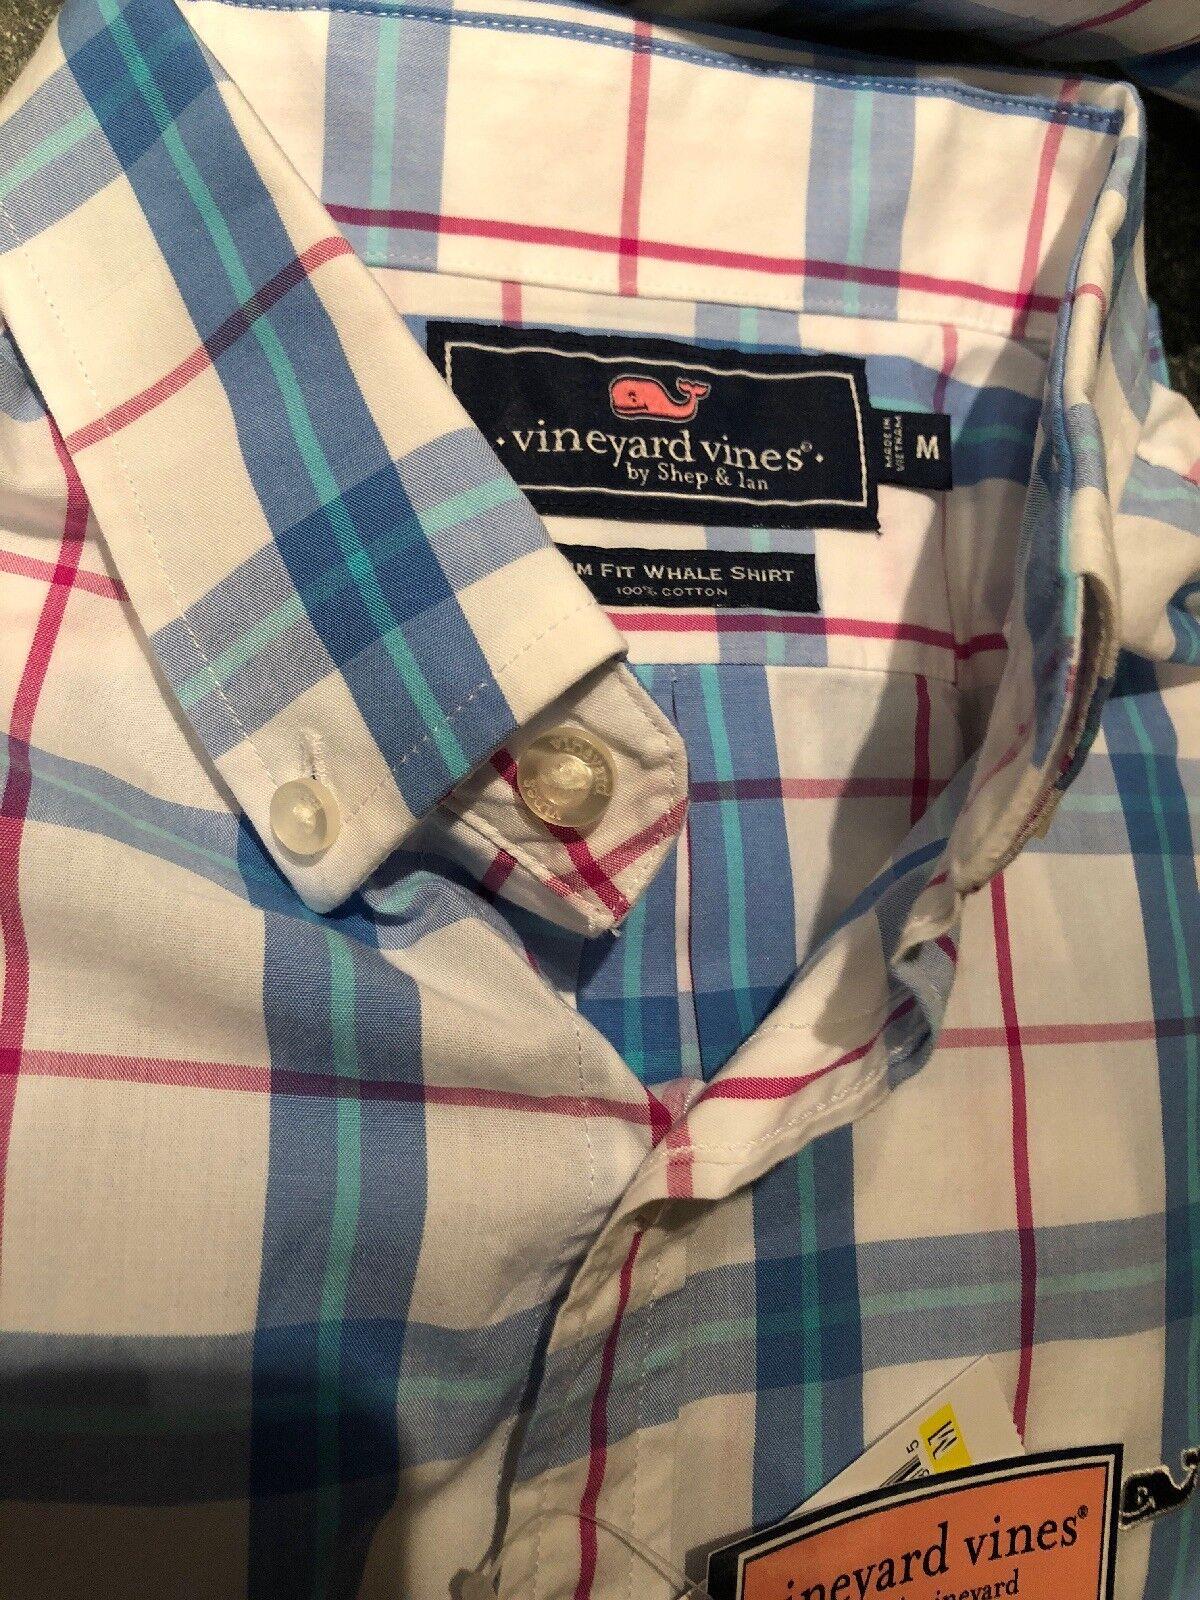 Vineyard Vines Whale Shirt Marsara Plaid Aurora Aurora Aurora Slim Fit LS Medium M  NWT  98 05698c